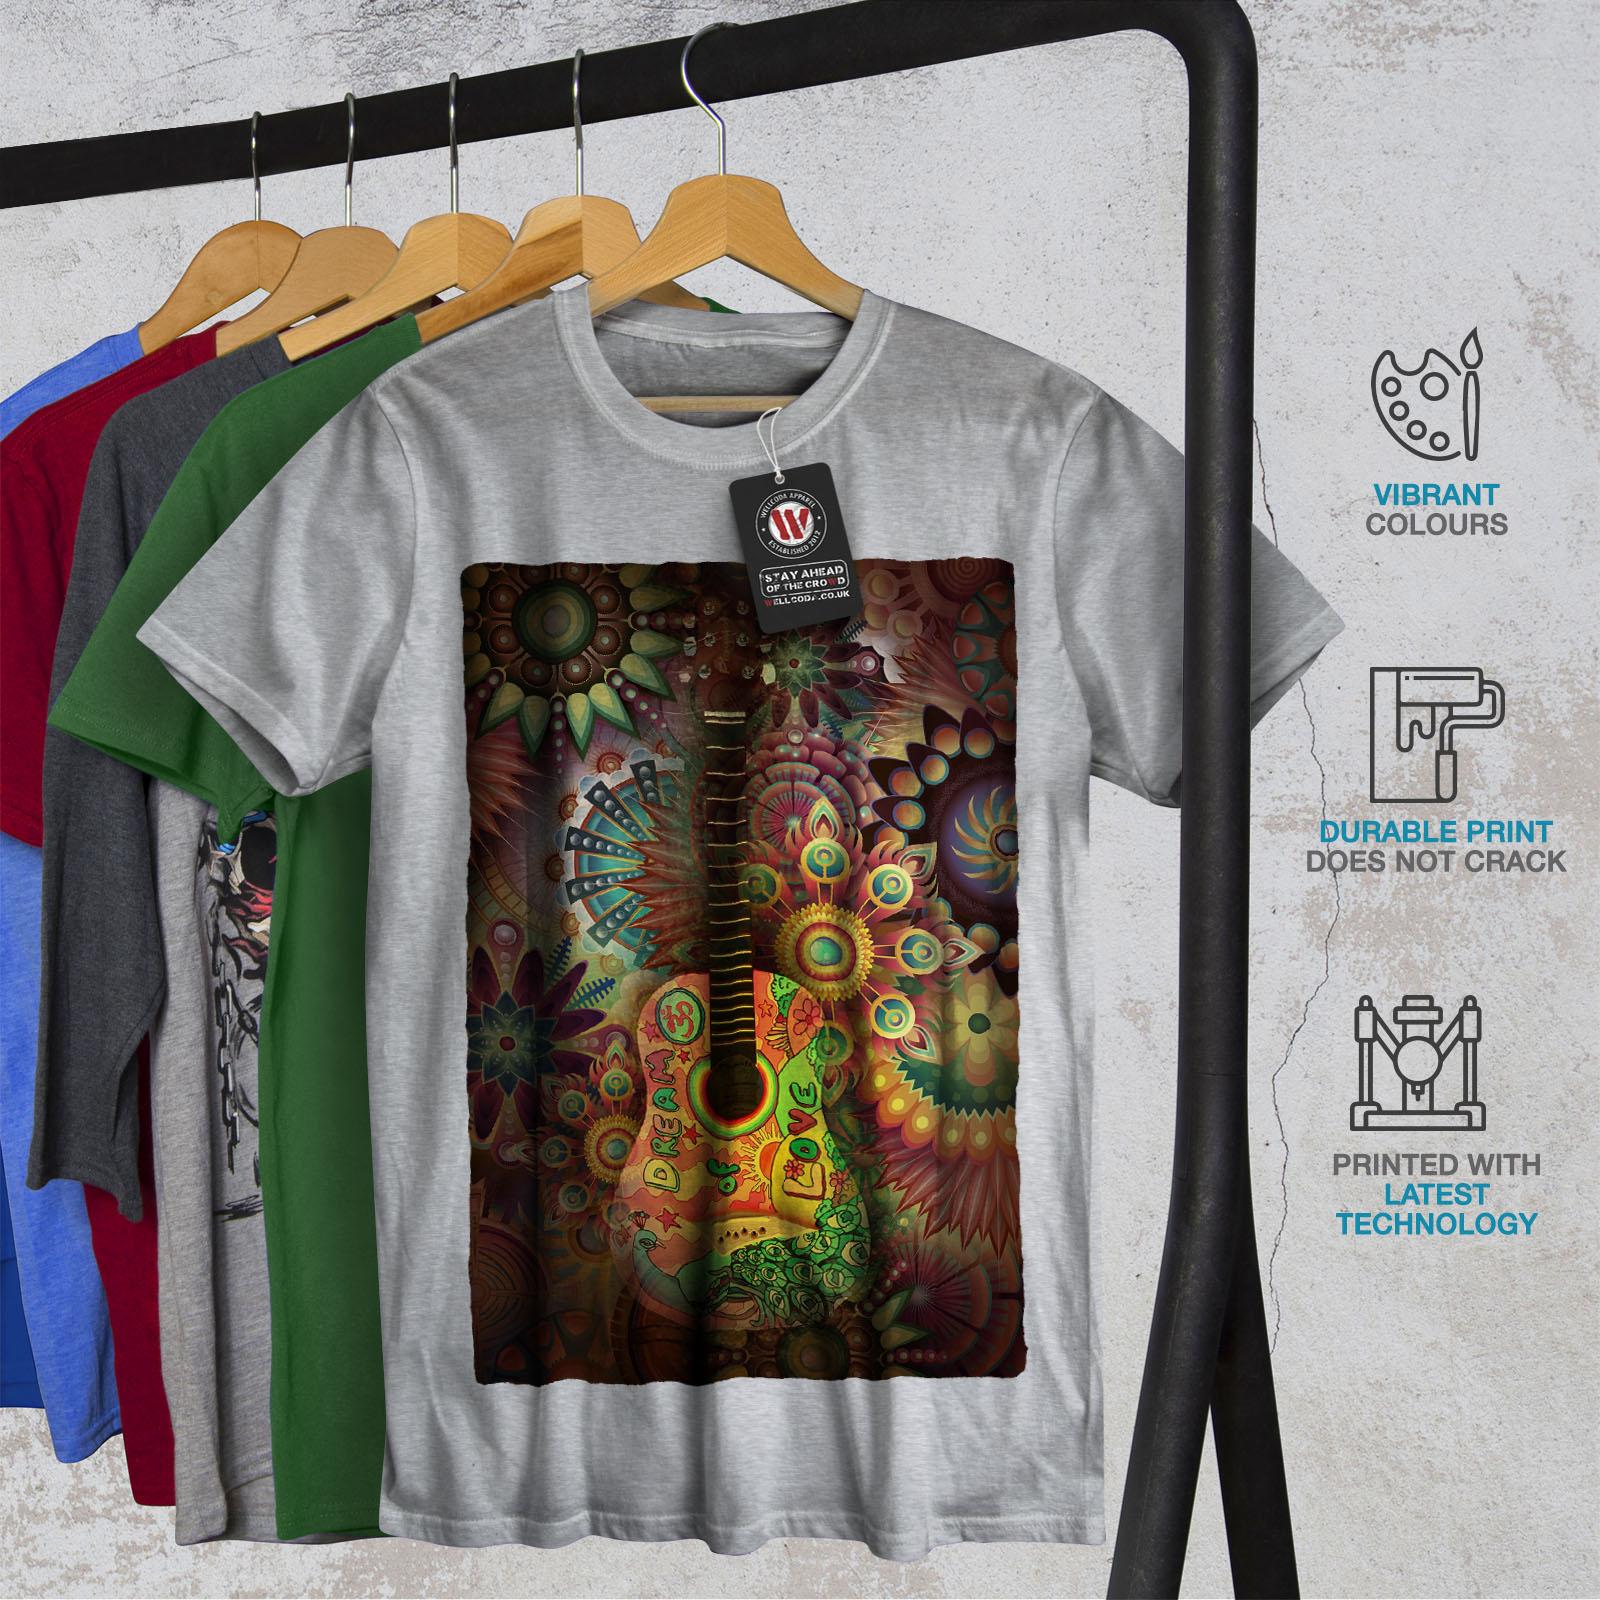 Wellcoda-Colorful-Guitar-Mens-T-shirt-Music-Graphic-Design-Printed-Tee thumbnail 18